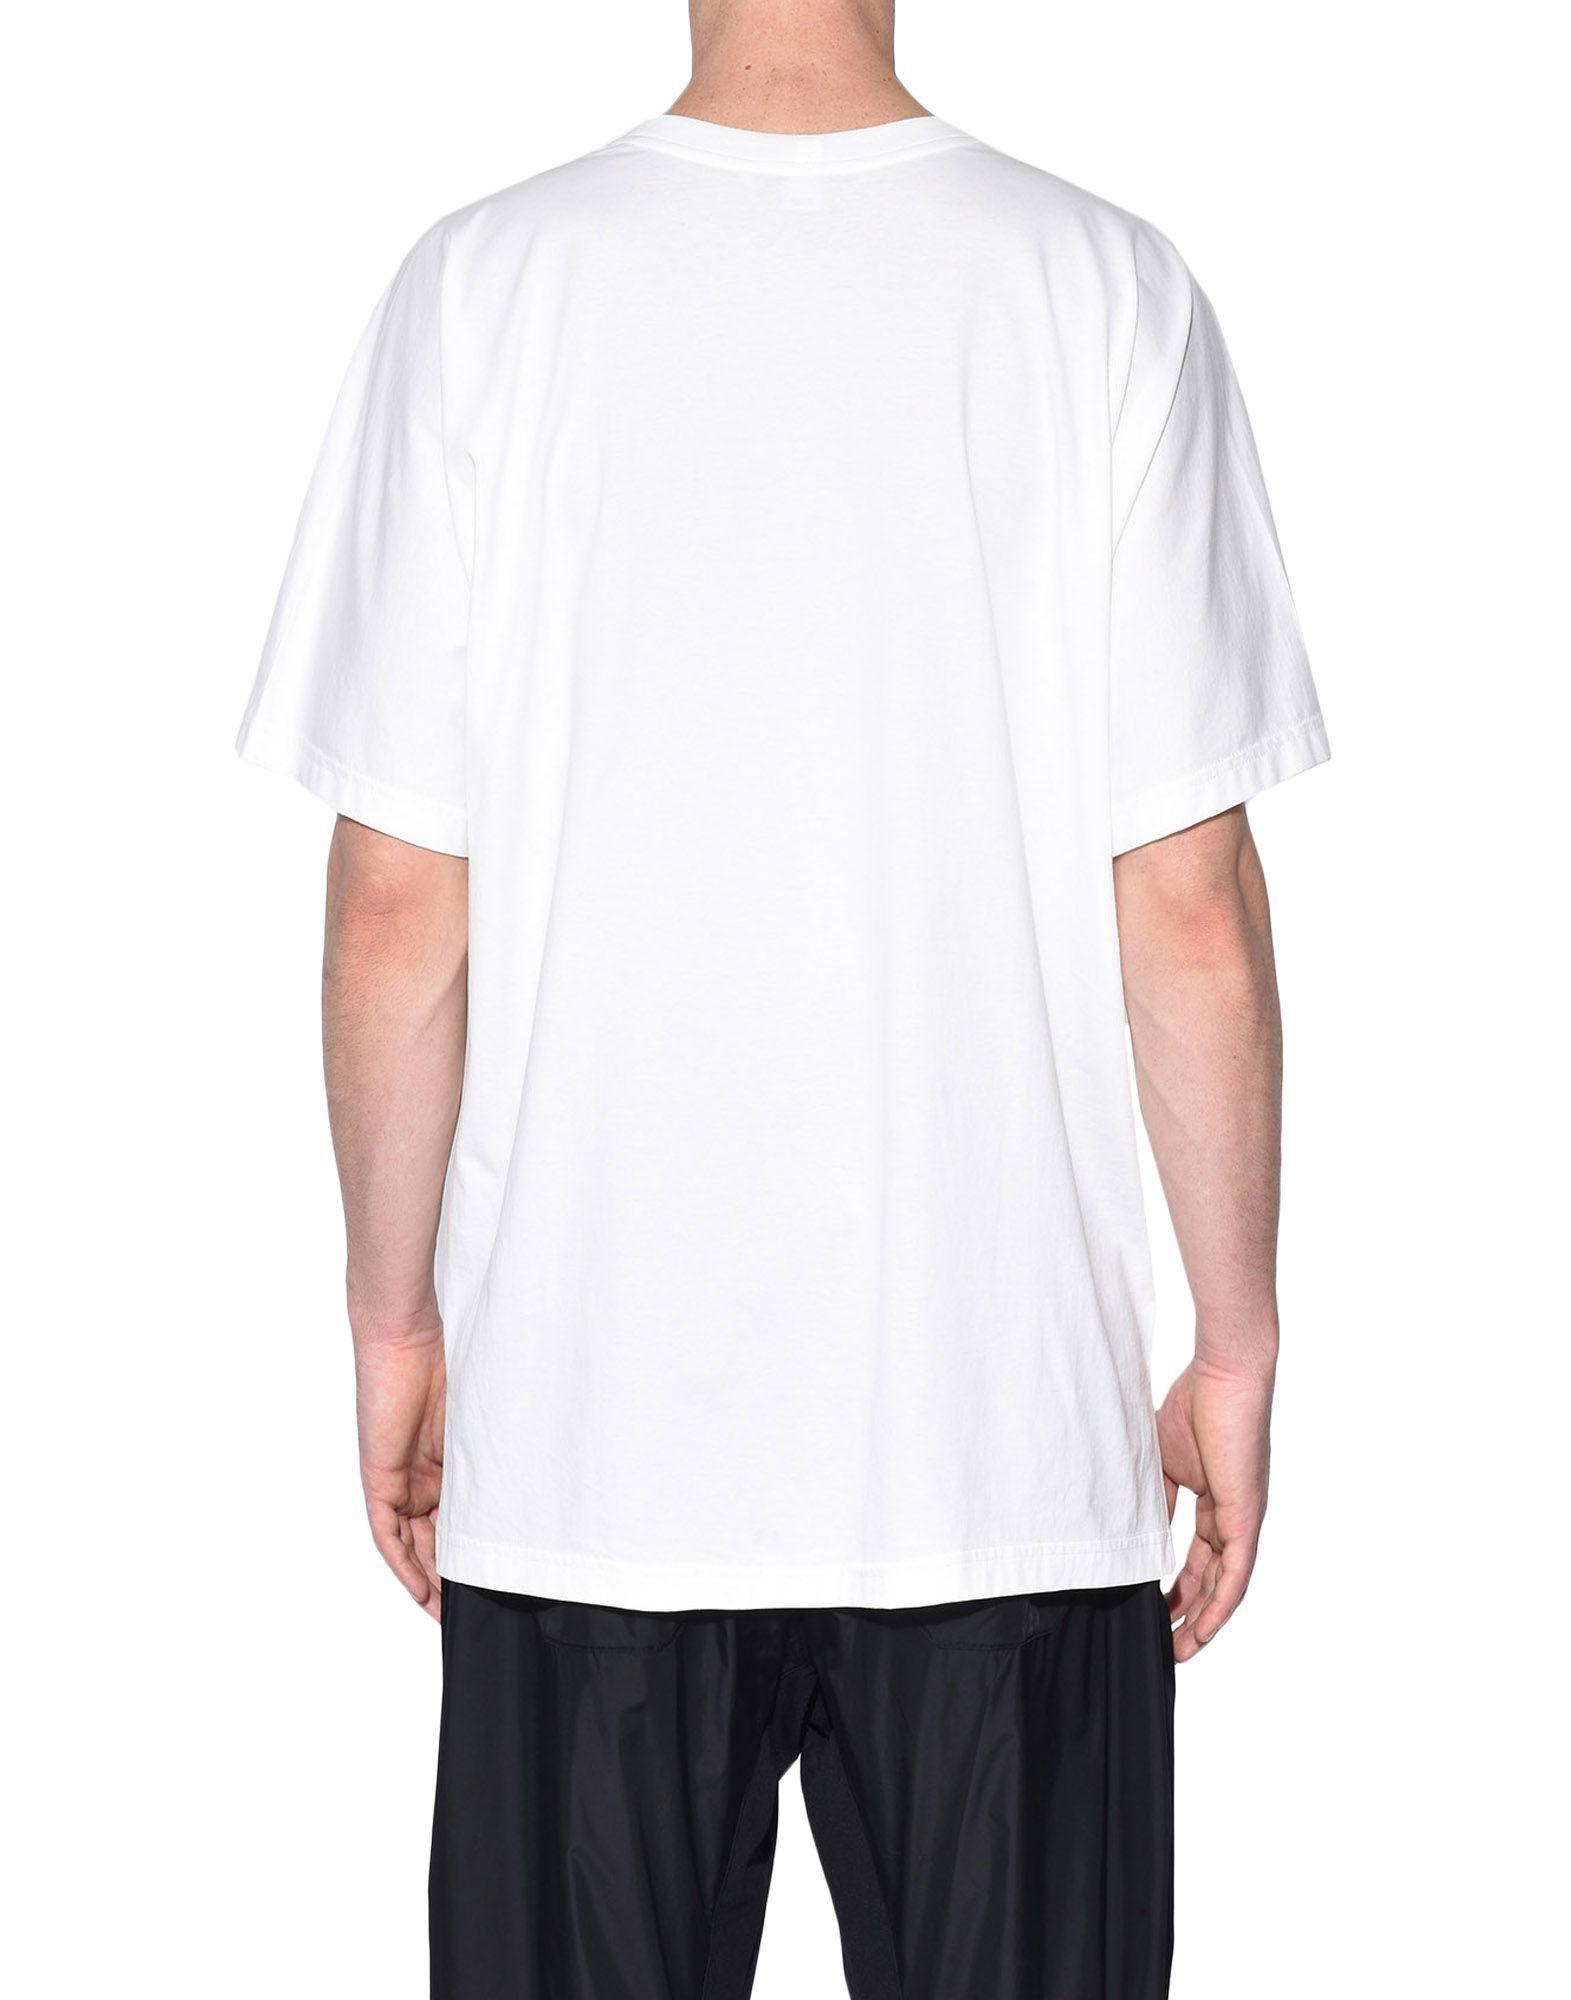 Y-3 Y-3 Signature Tee Short sleeve t-shirt Man d